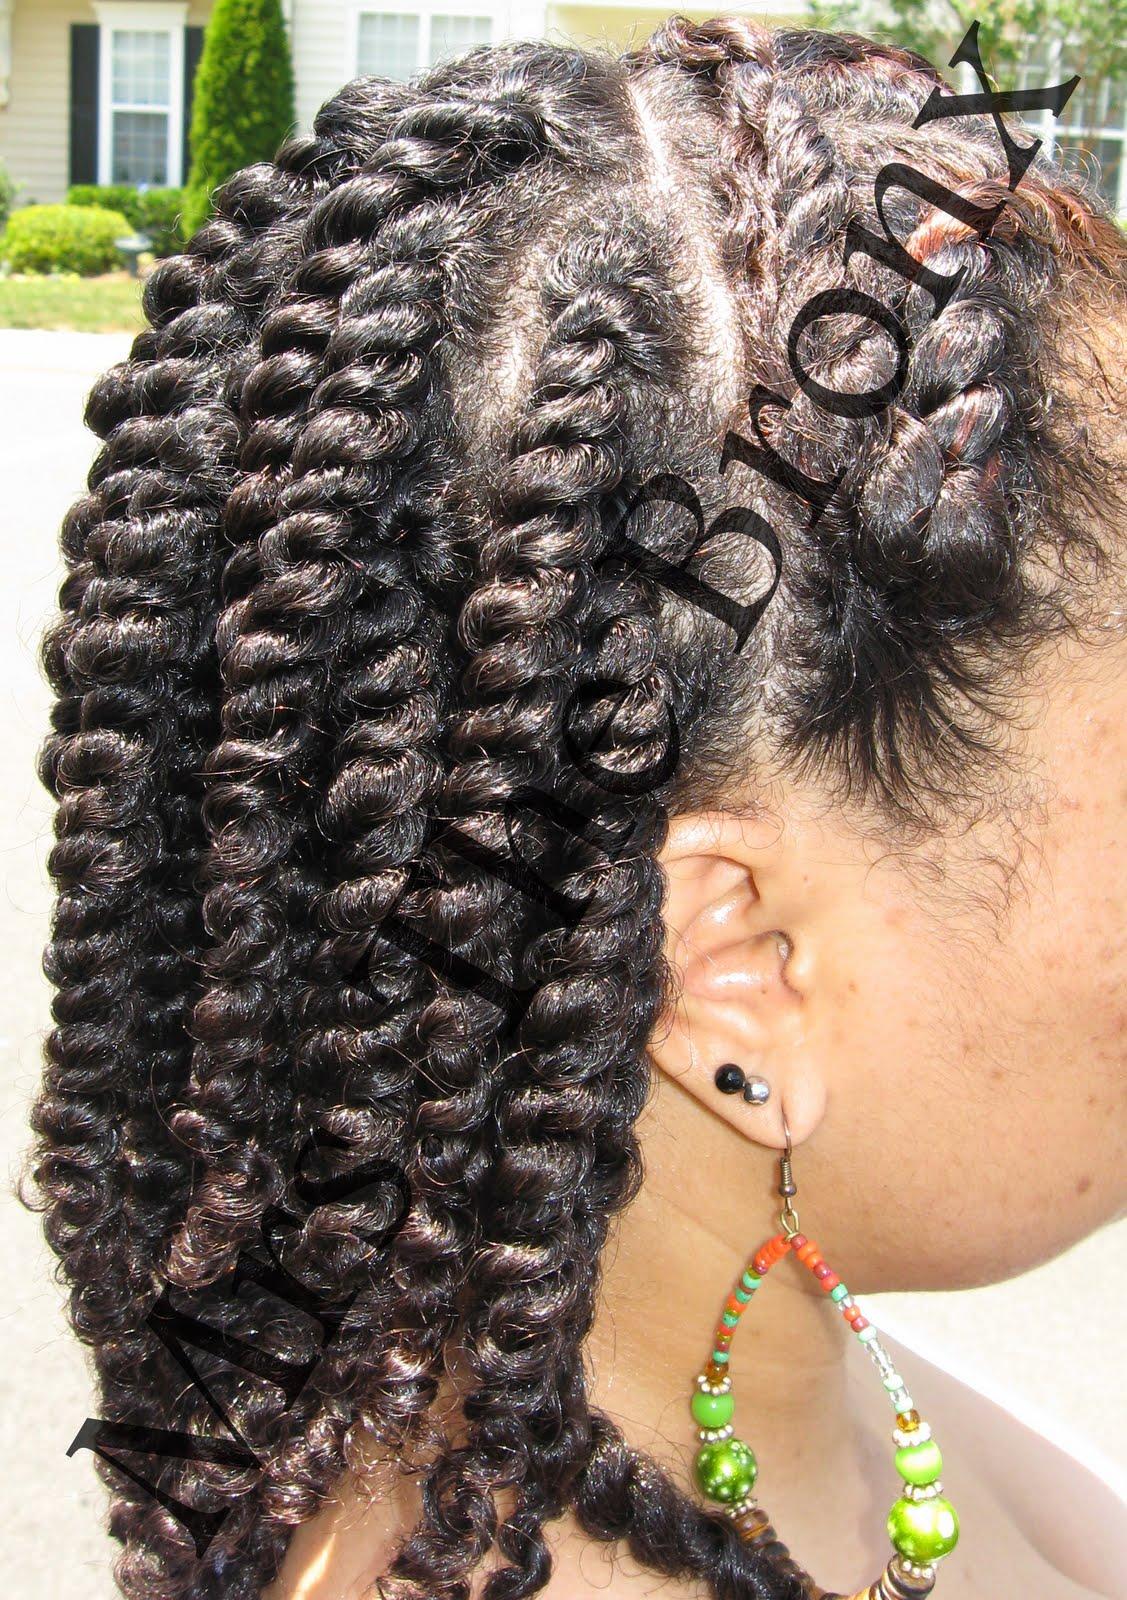 Heavenly Hues Hair Do S Alternative To 2 Flat Twists A Bun